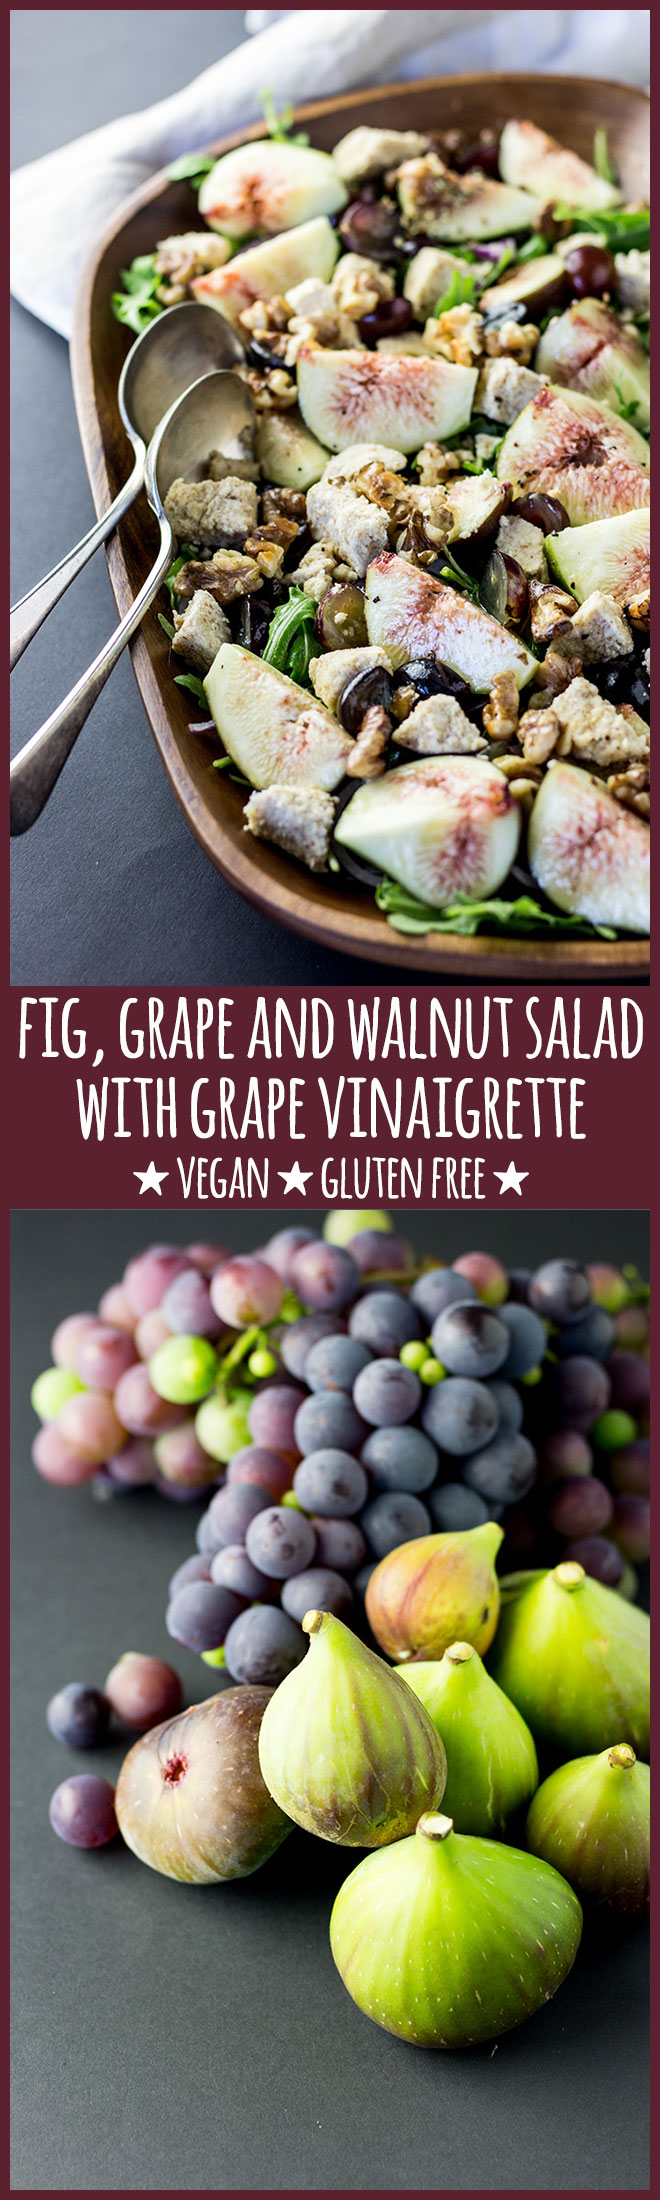 Fresh fig, grape and walnut salad with grape vinaigrette (vegan and gluten free).